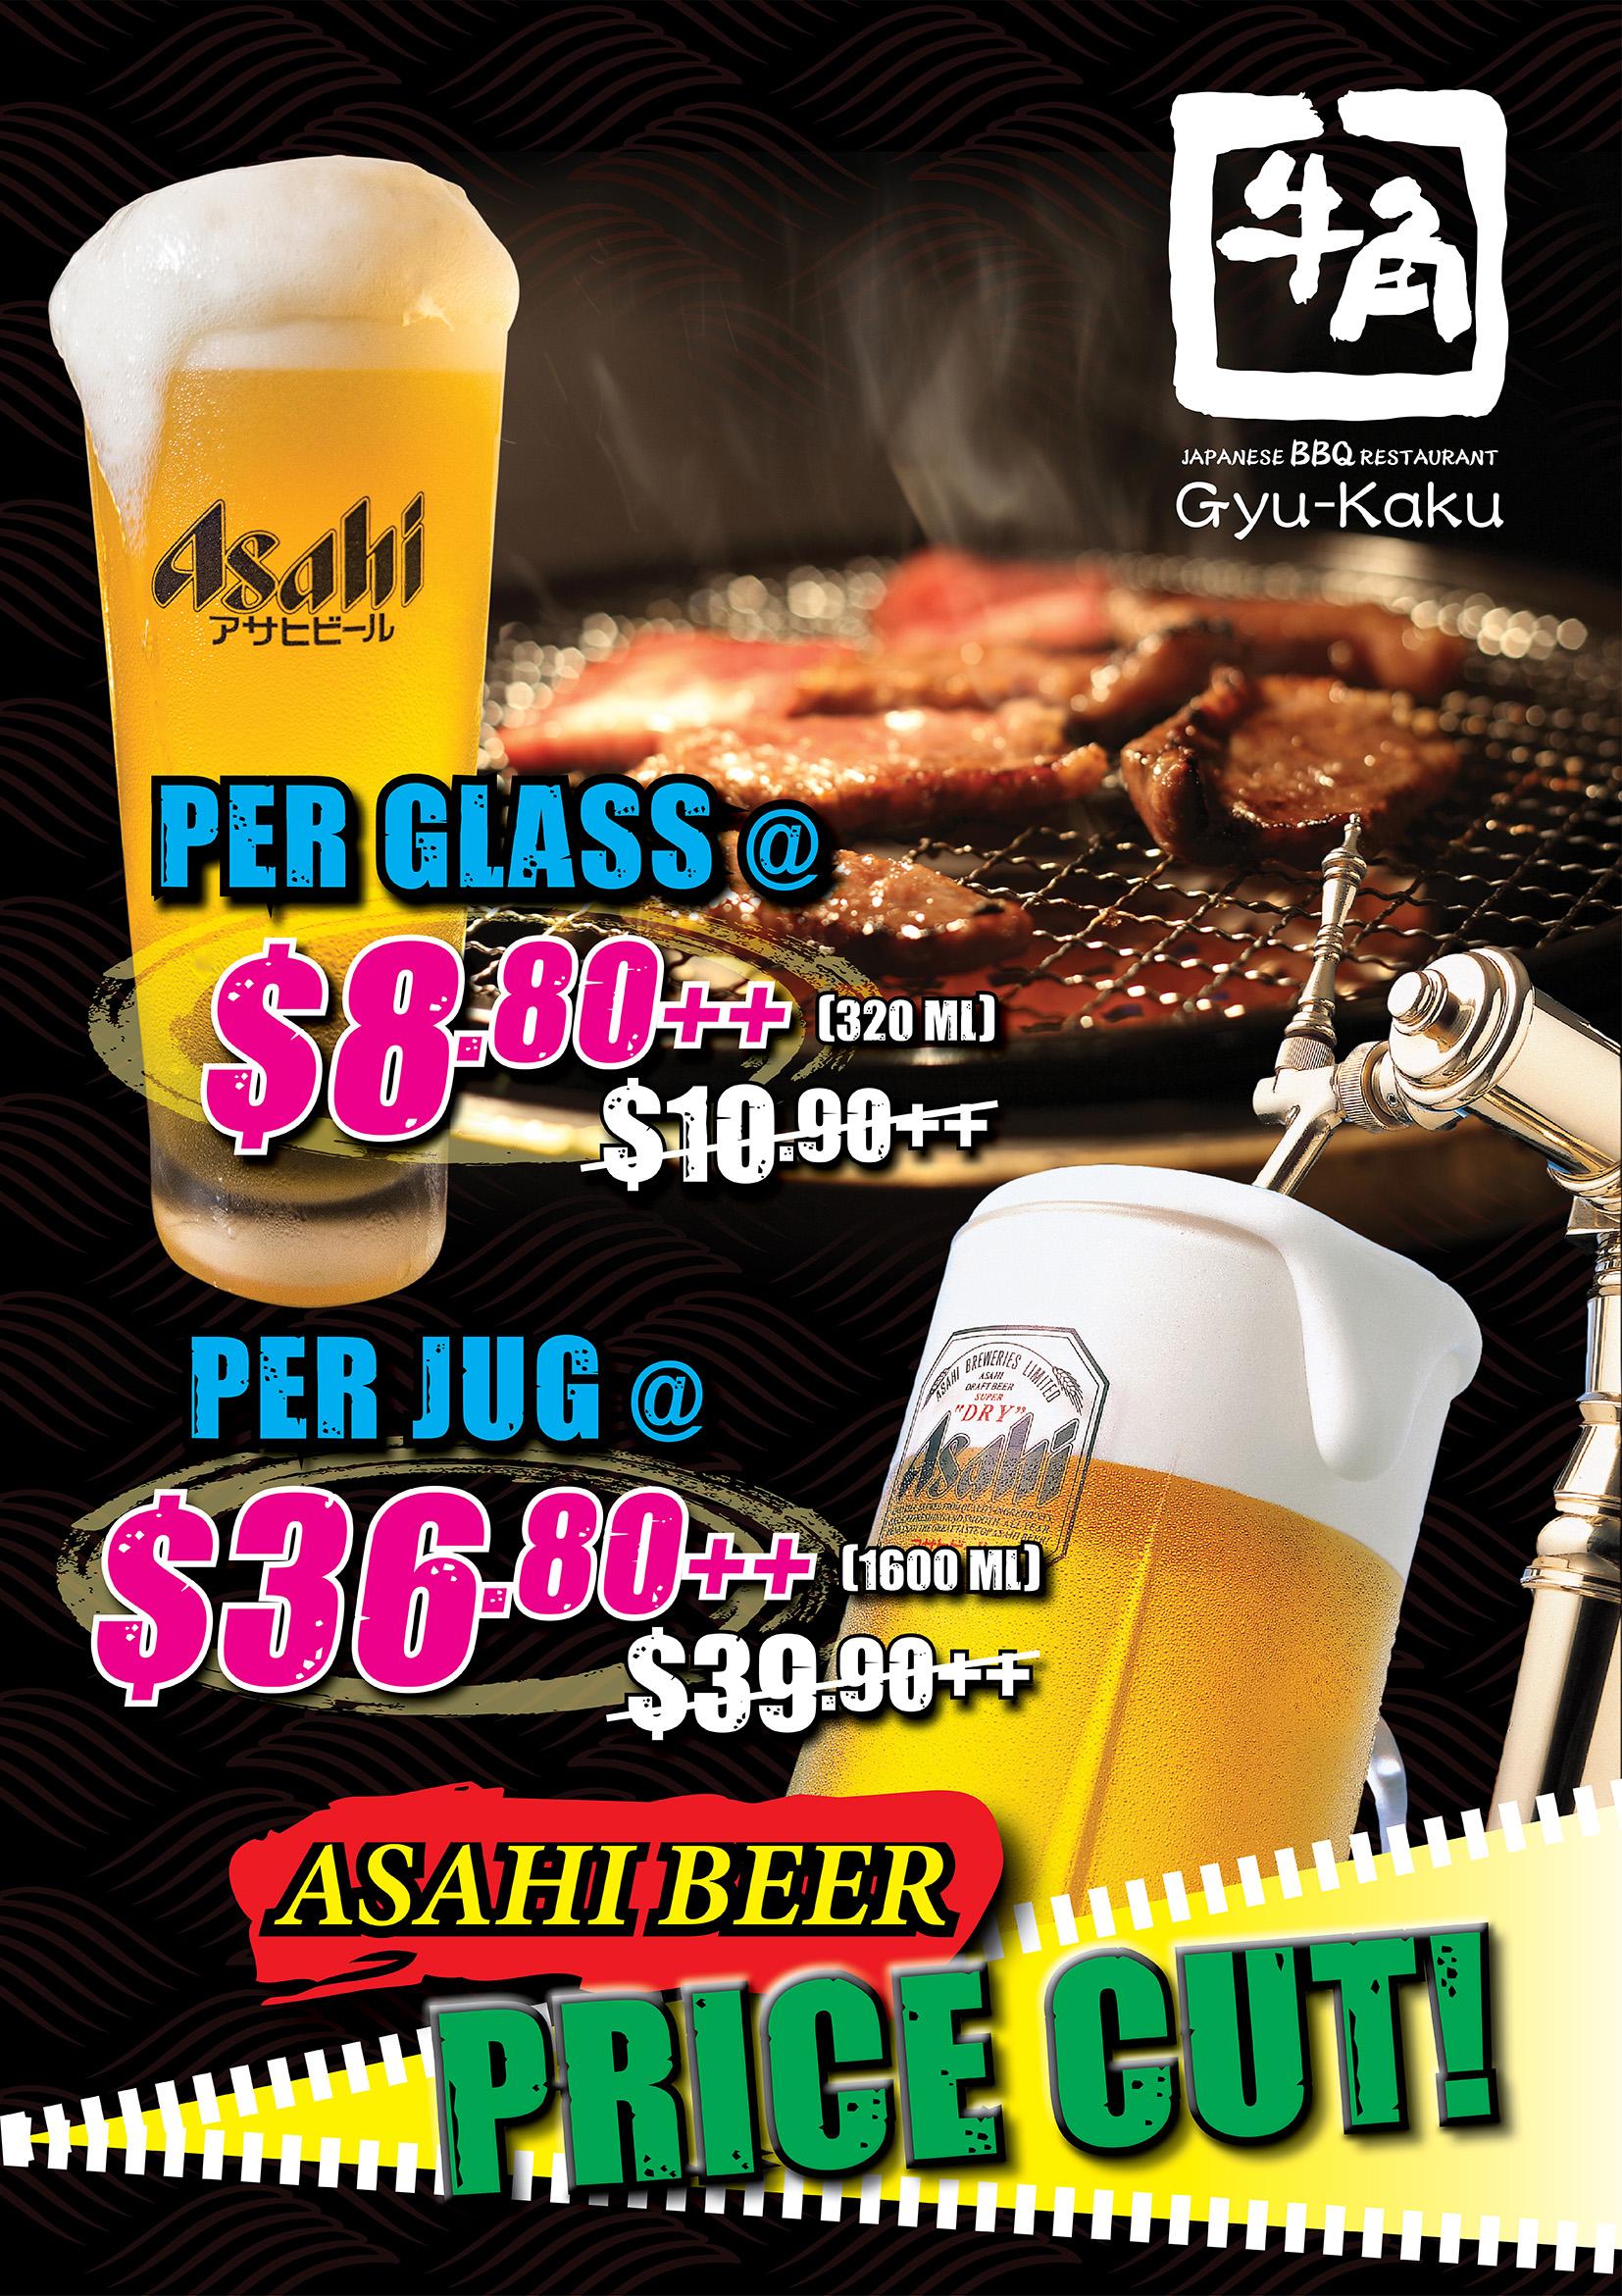 Gyu-Kaku A1 Asahi Beer Poster A4-FB.jpg